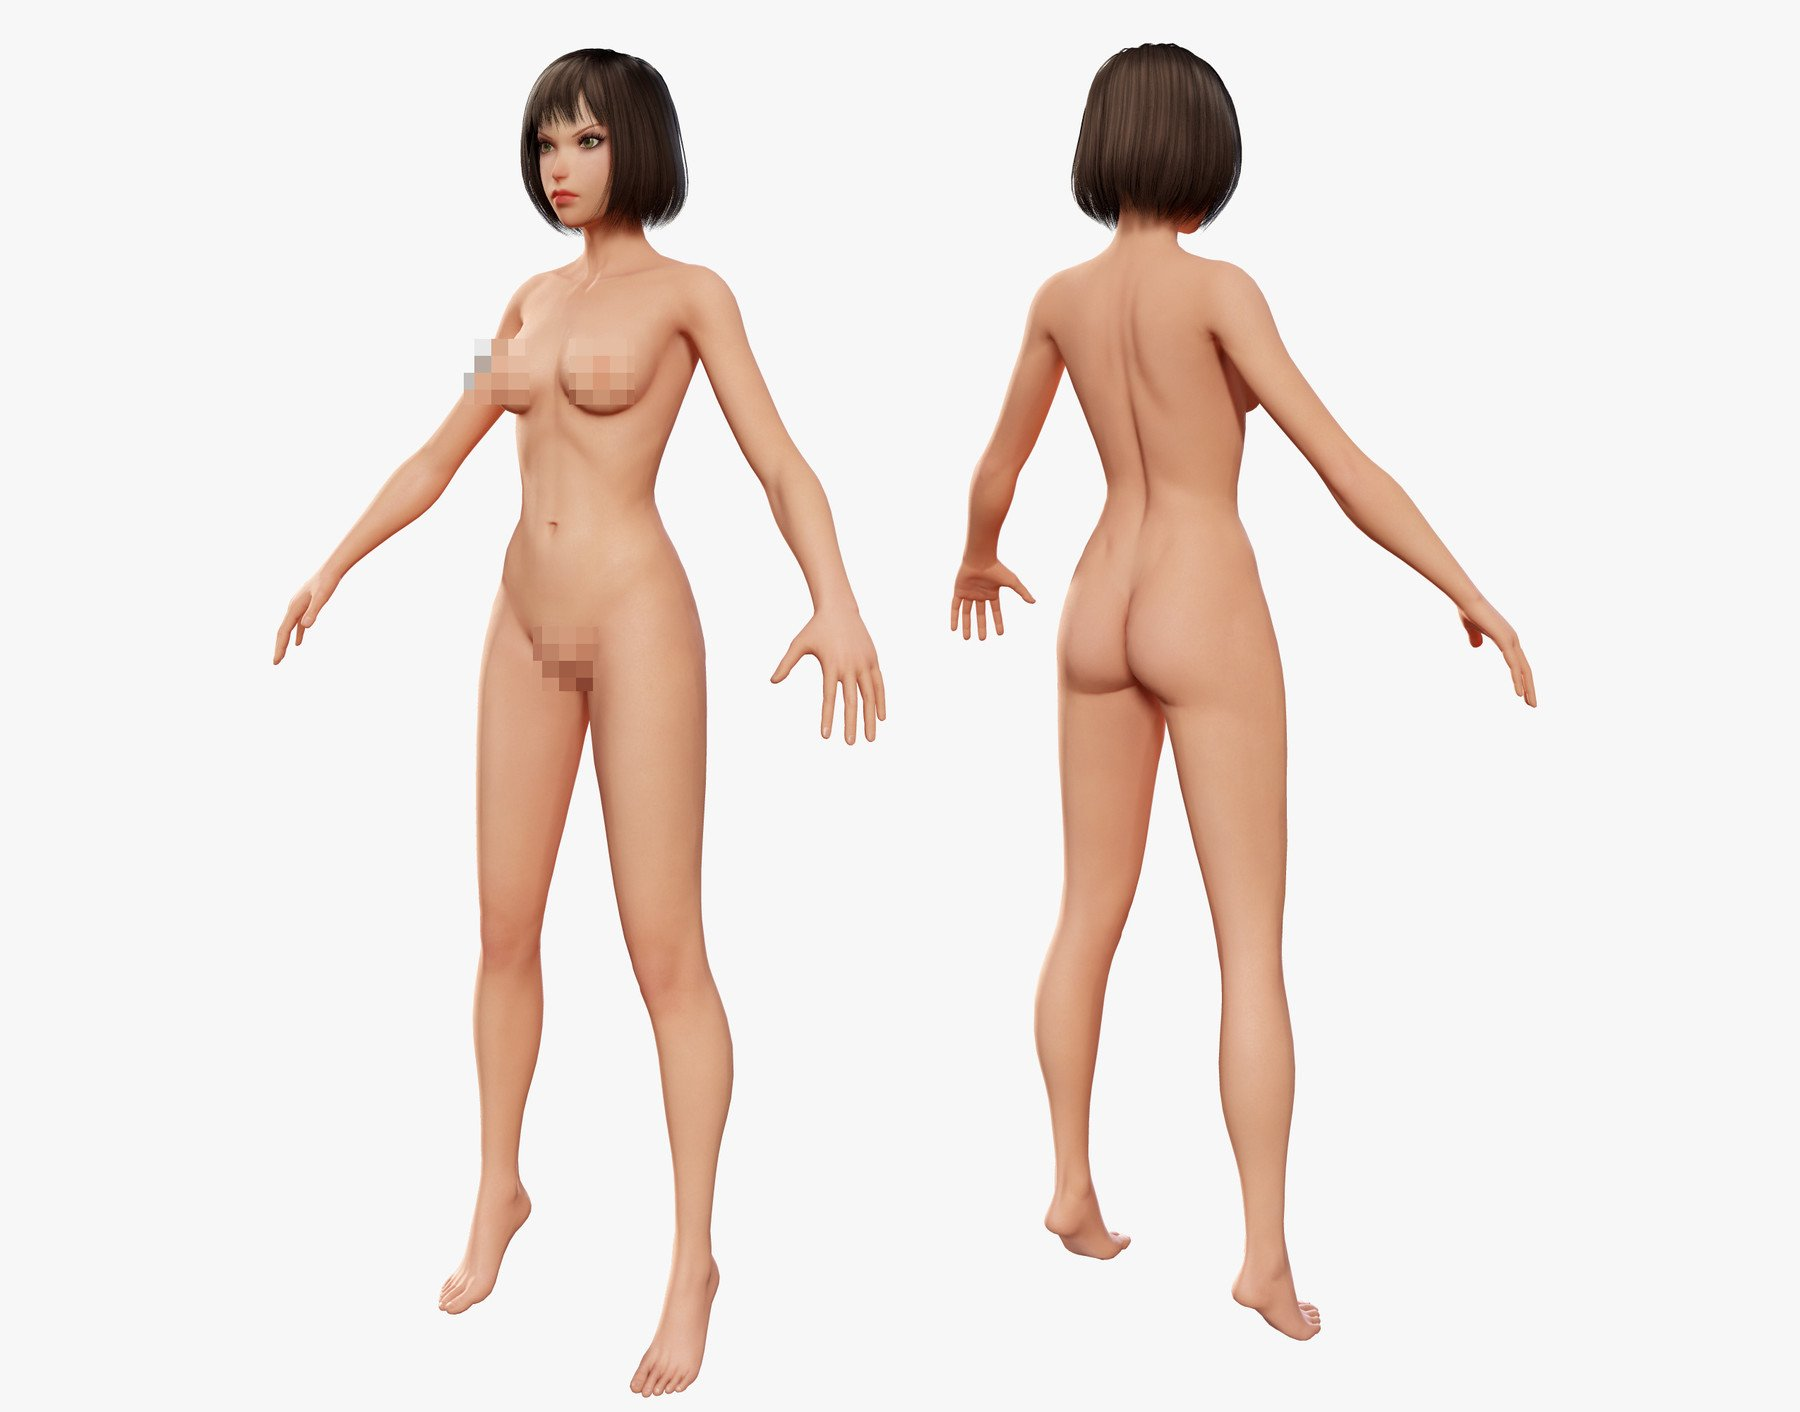 Naked women cartoon